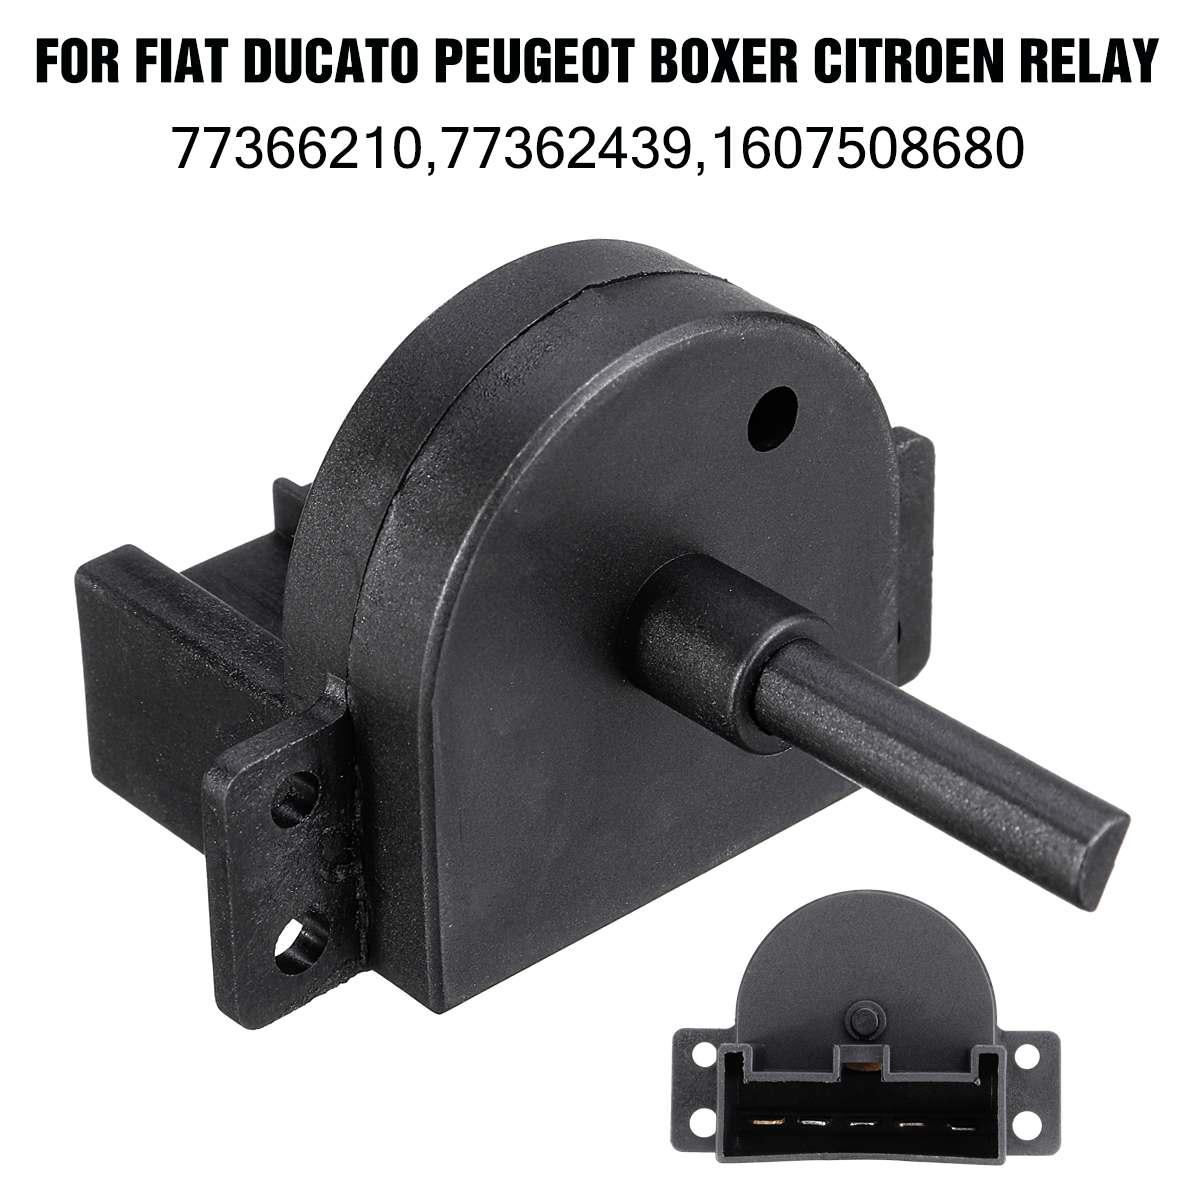 Car Heater Blower Fan Switch For Fiat Ducato For Peugeot Boxer For Citroen Relay Jumper 2006- 77362439 77366210 77367027